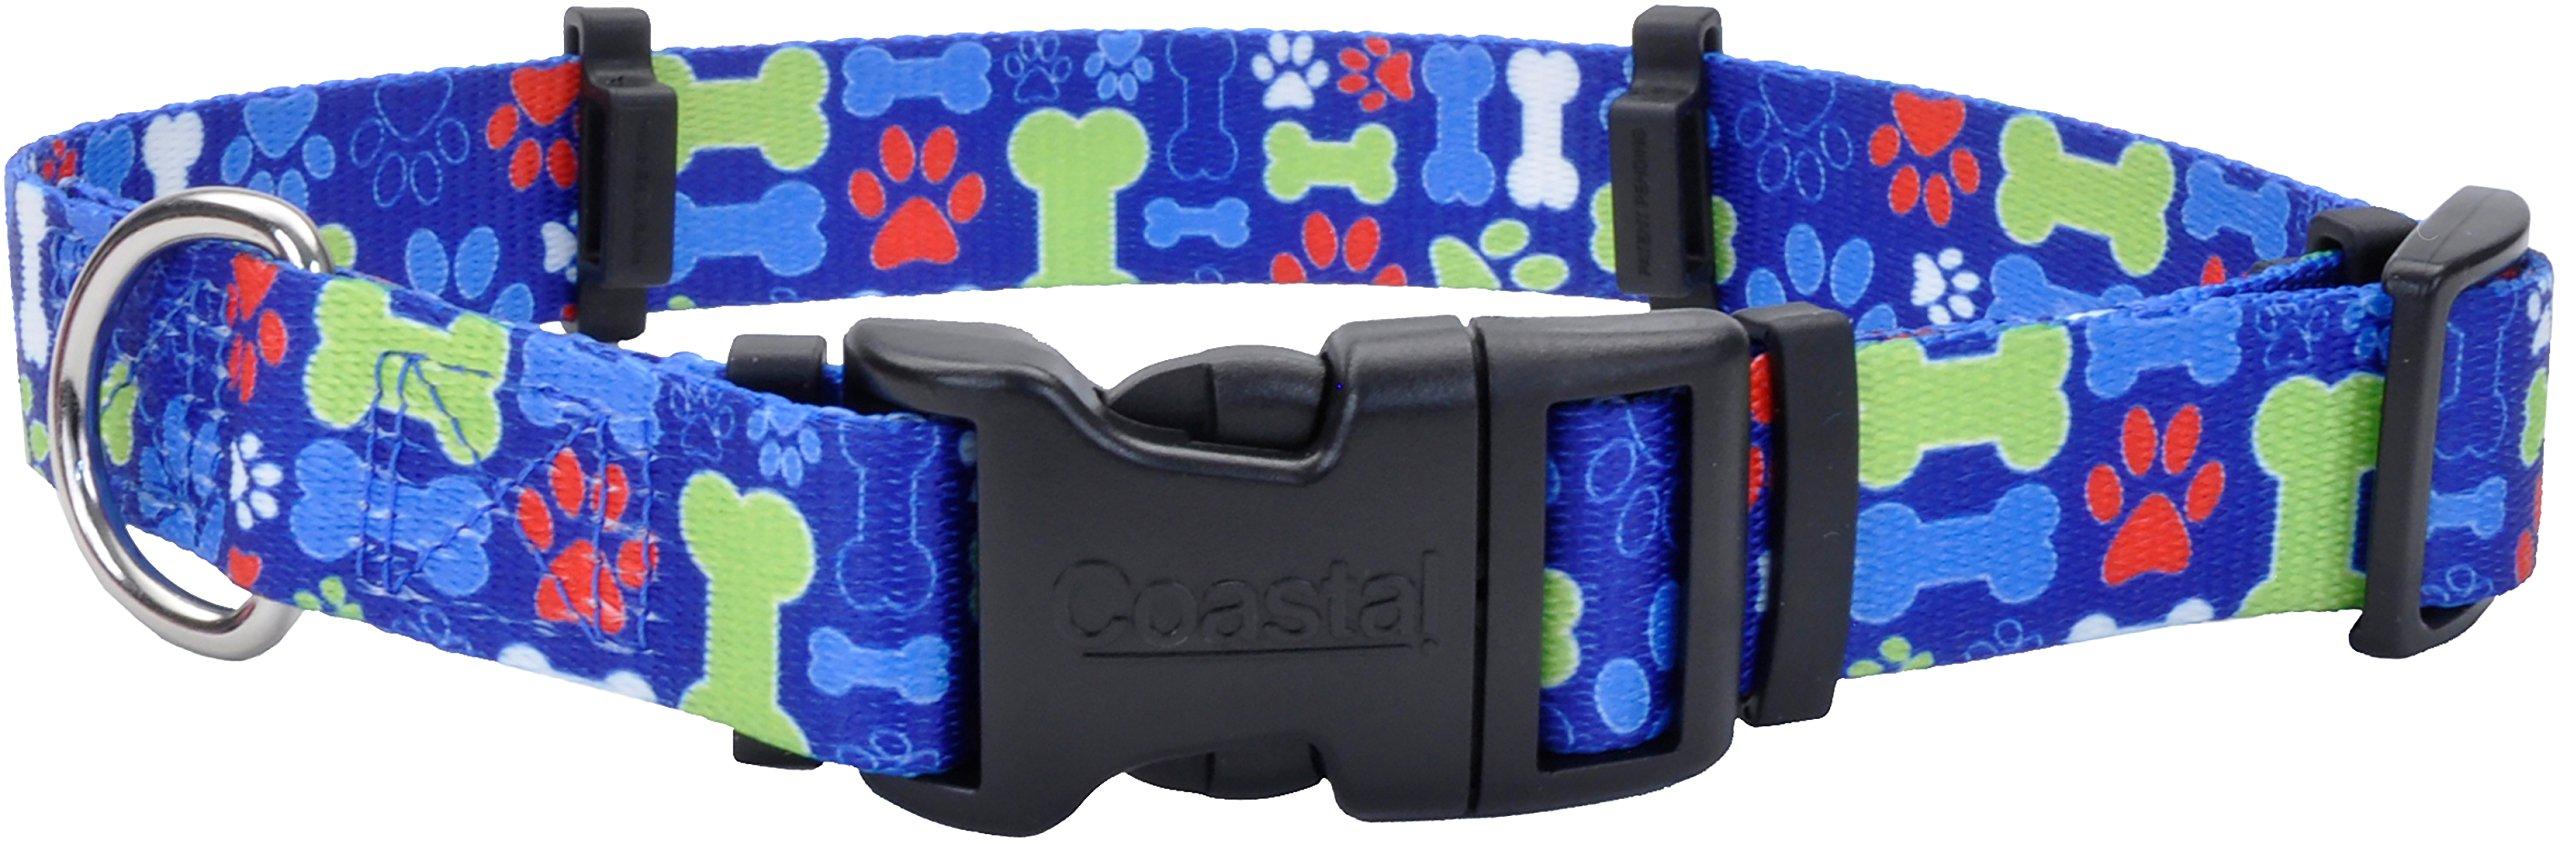 Coastal Pet Products 06195 MBN20 Flea Collar Protector, 1'' x 20'' Medium, Multi Bones